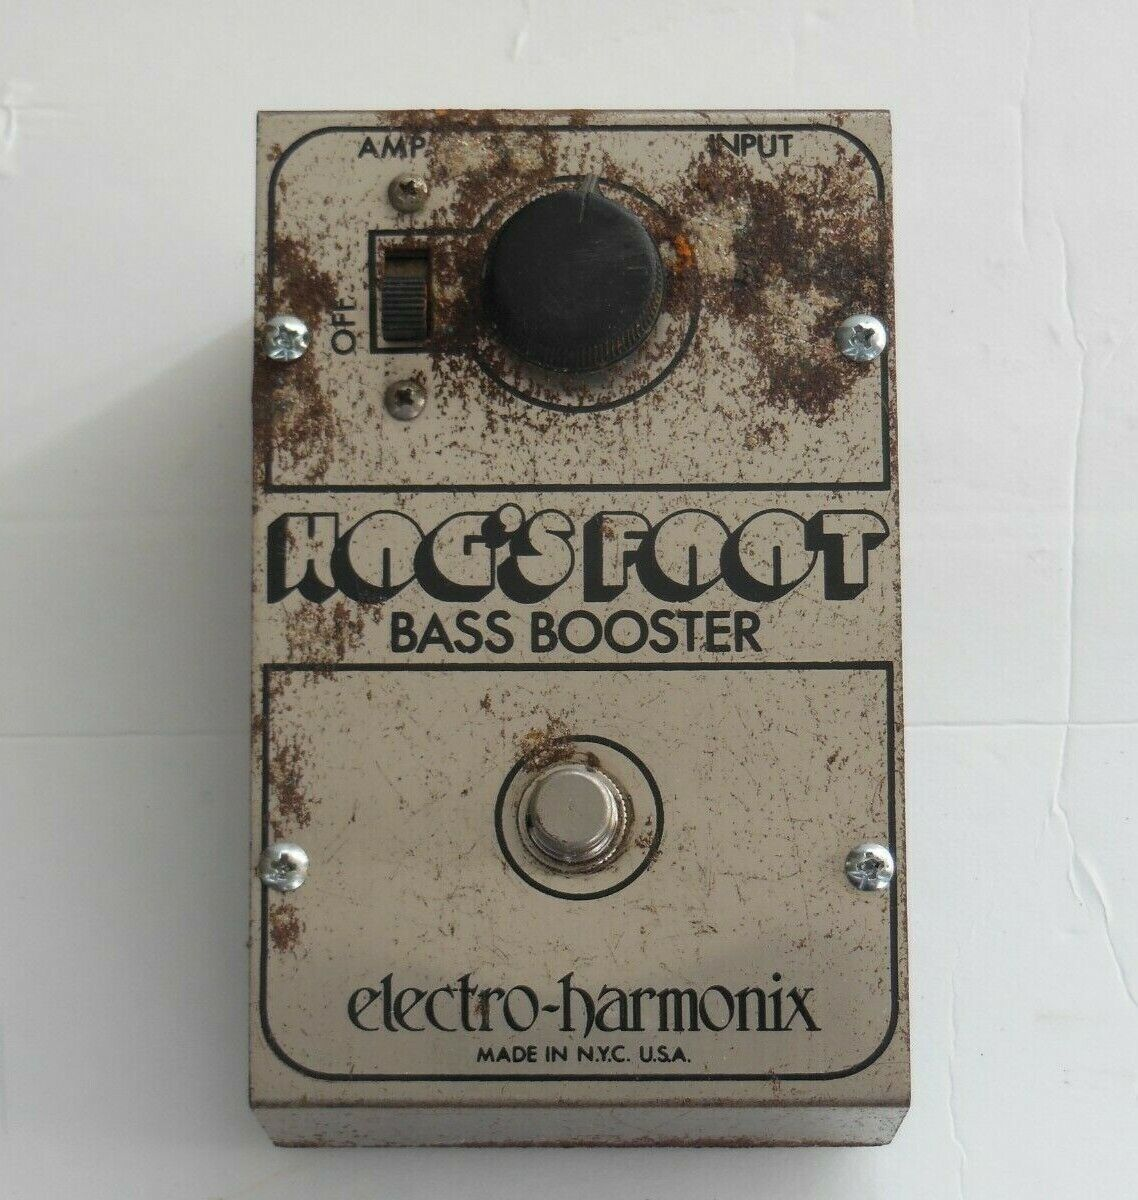 Vintage foot bass